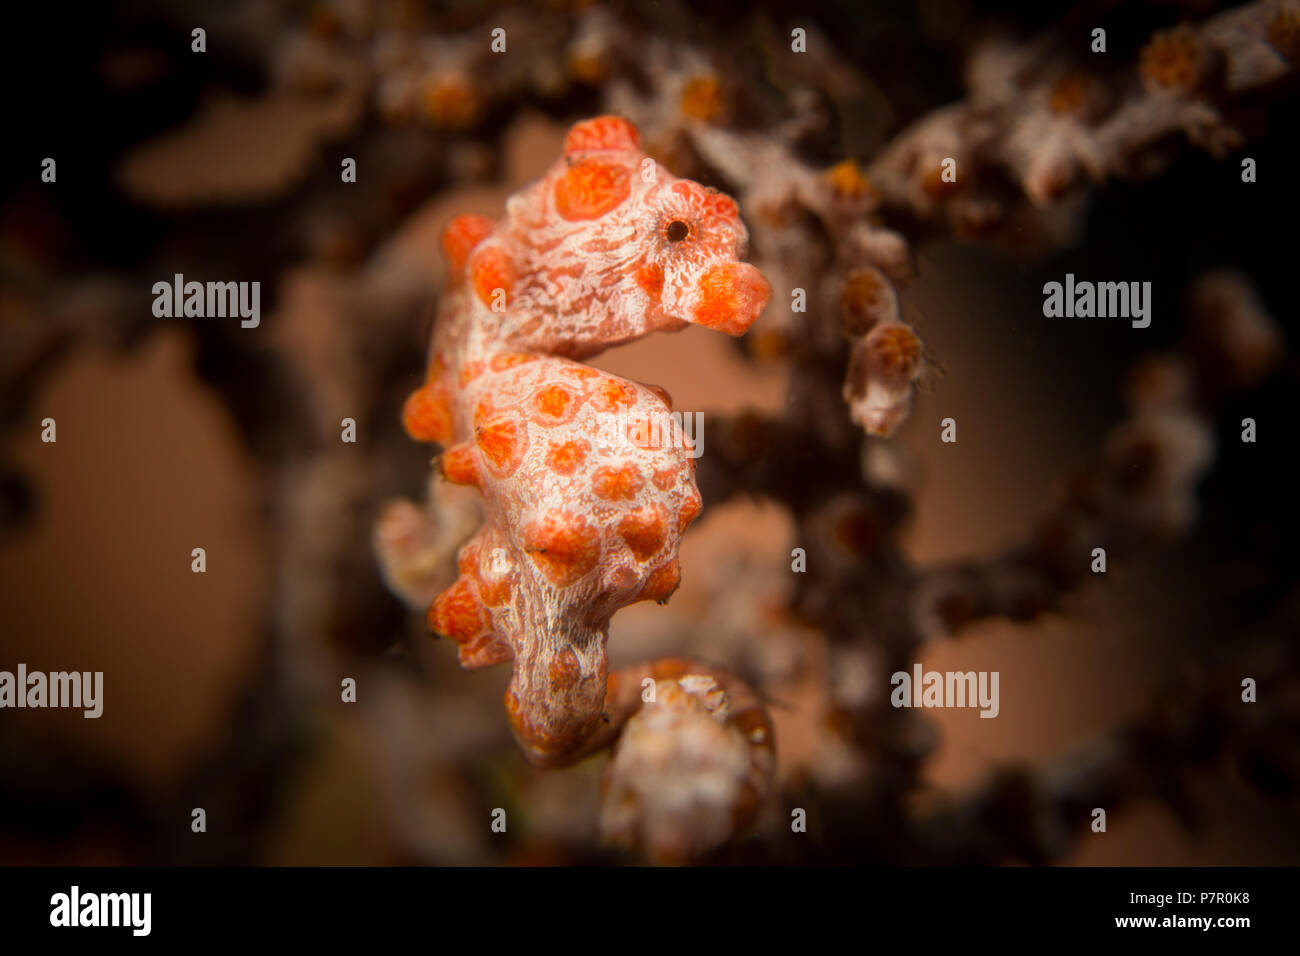 A Pygmy Seahorse - Hippocampus bargibanti - in its host gorgonion sea fan coral. Taken in Komodo National Park, Indonesia. Stock Photo